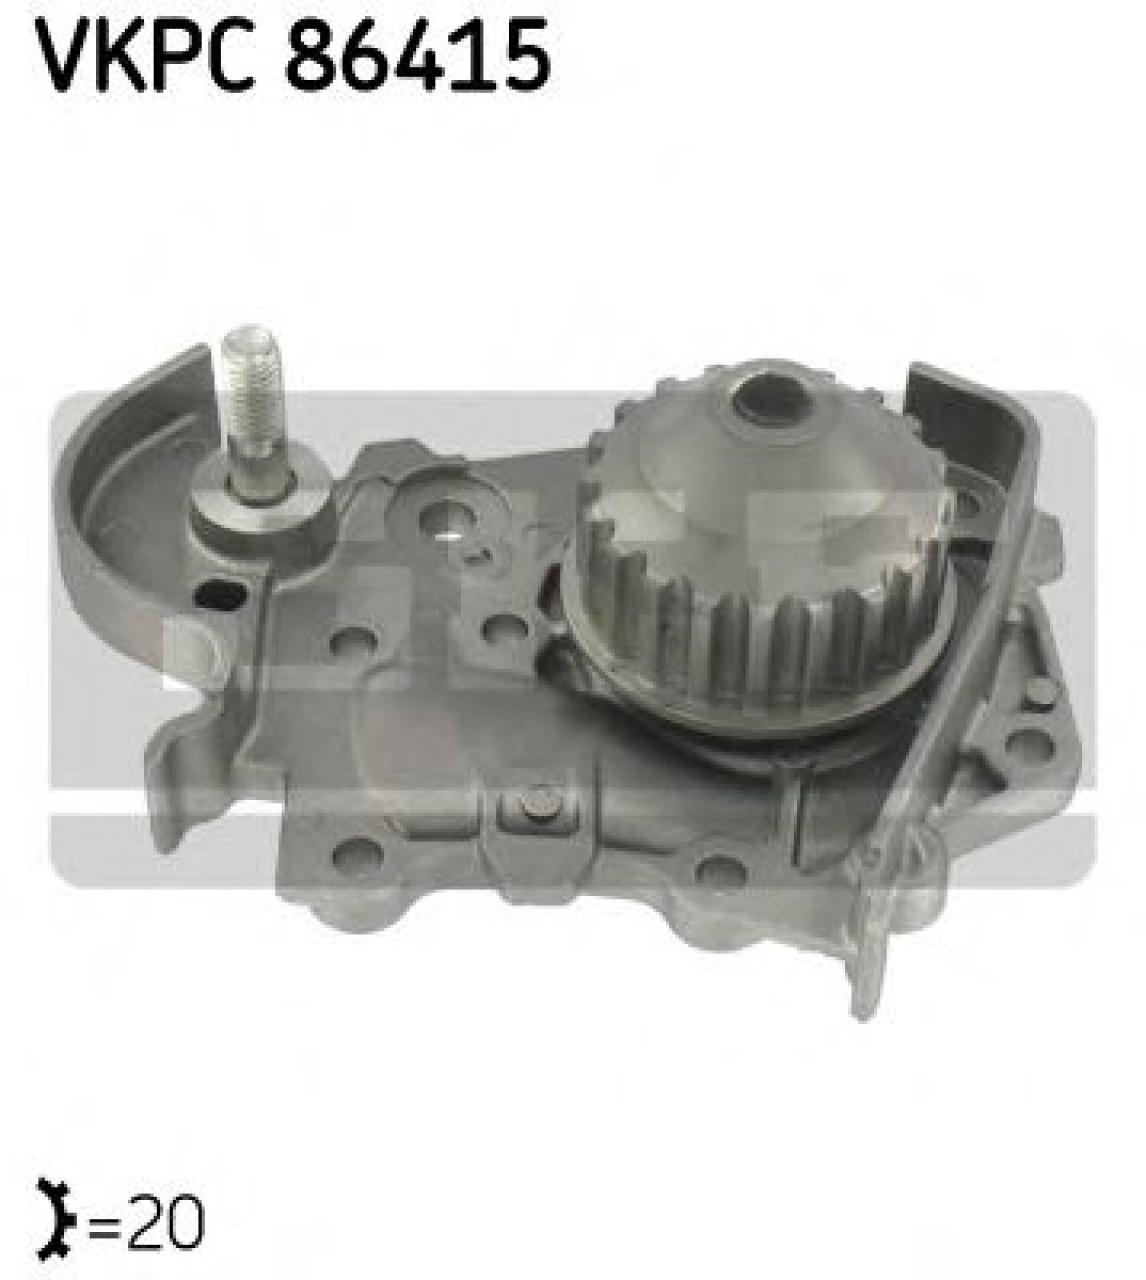 Pompa apa DACIA LOGAN MCV (KS) (2007 - 2016) SKF VKPC 86415 - produs NOU